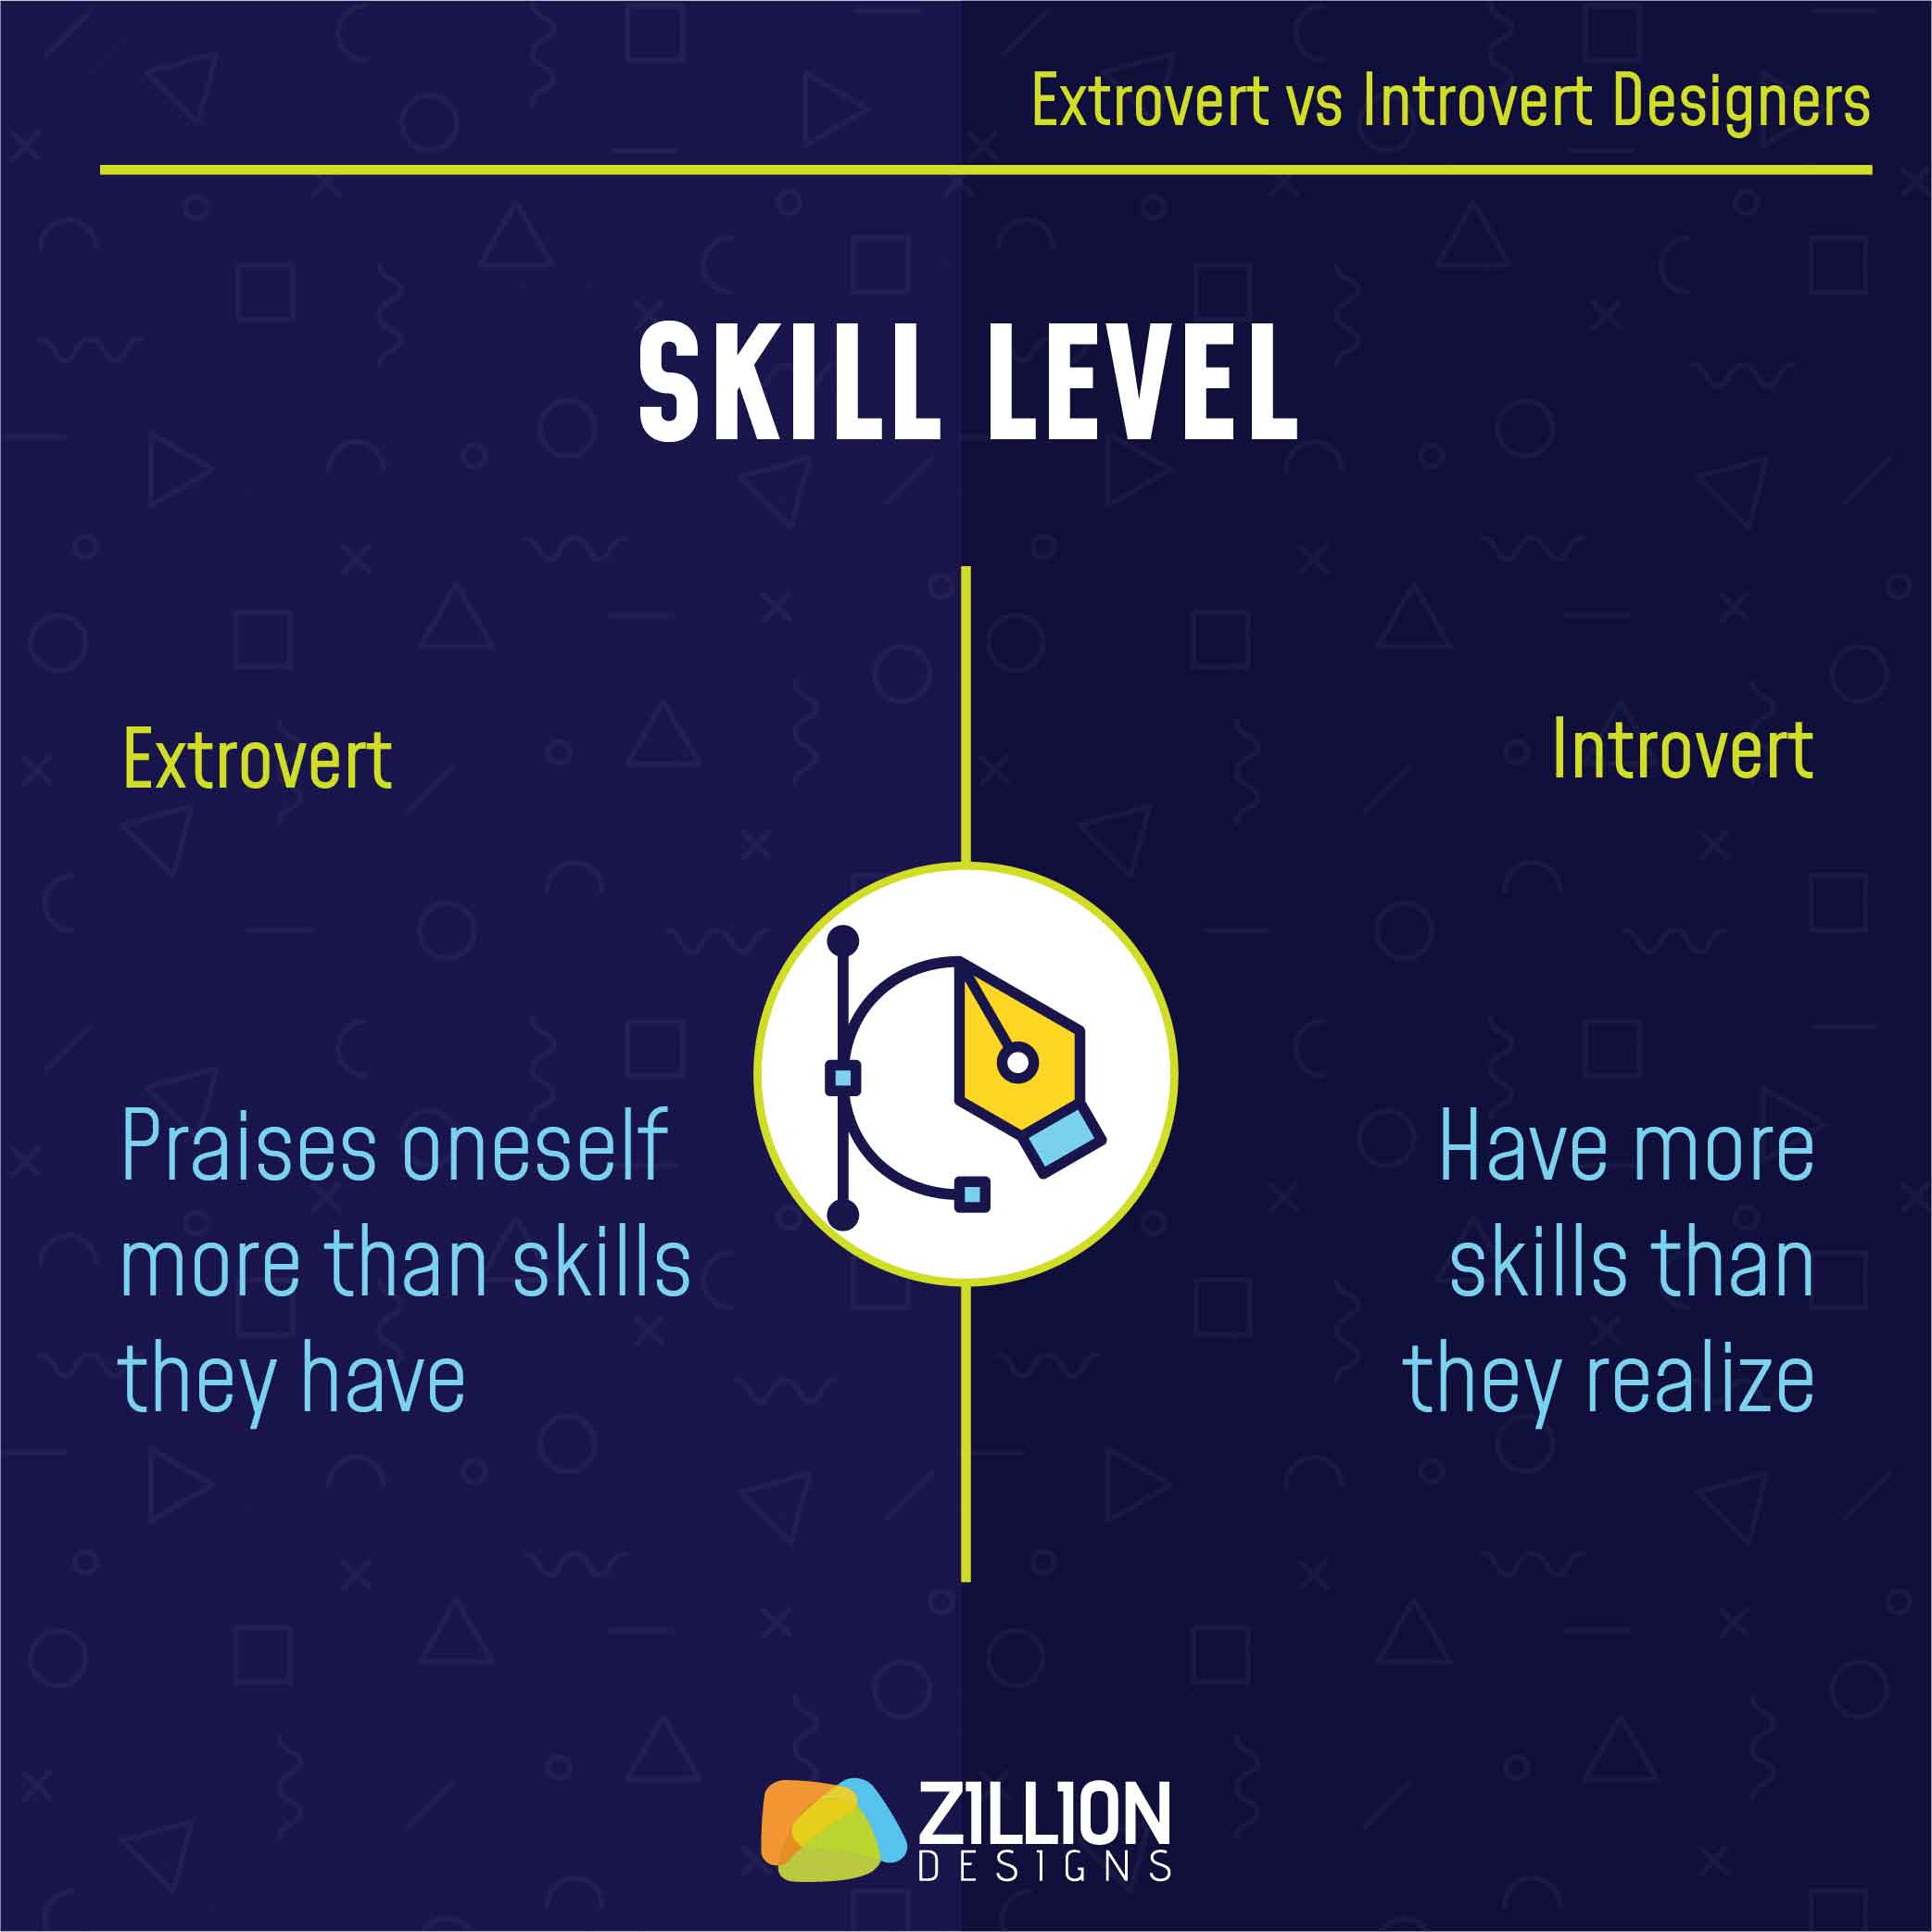 Extrovert vs Introvert Designers 7